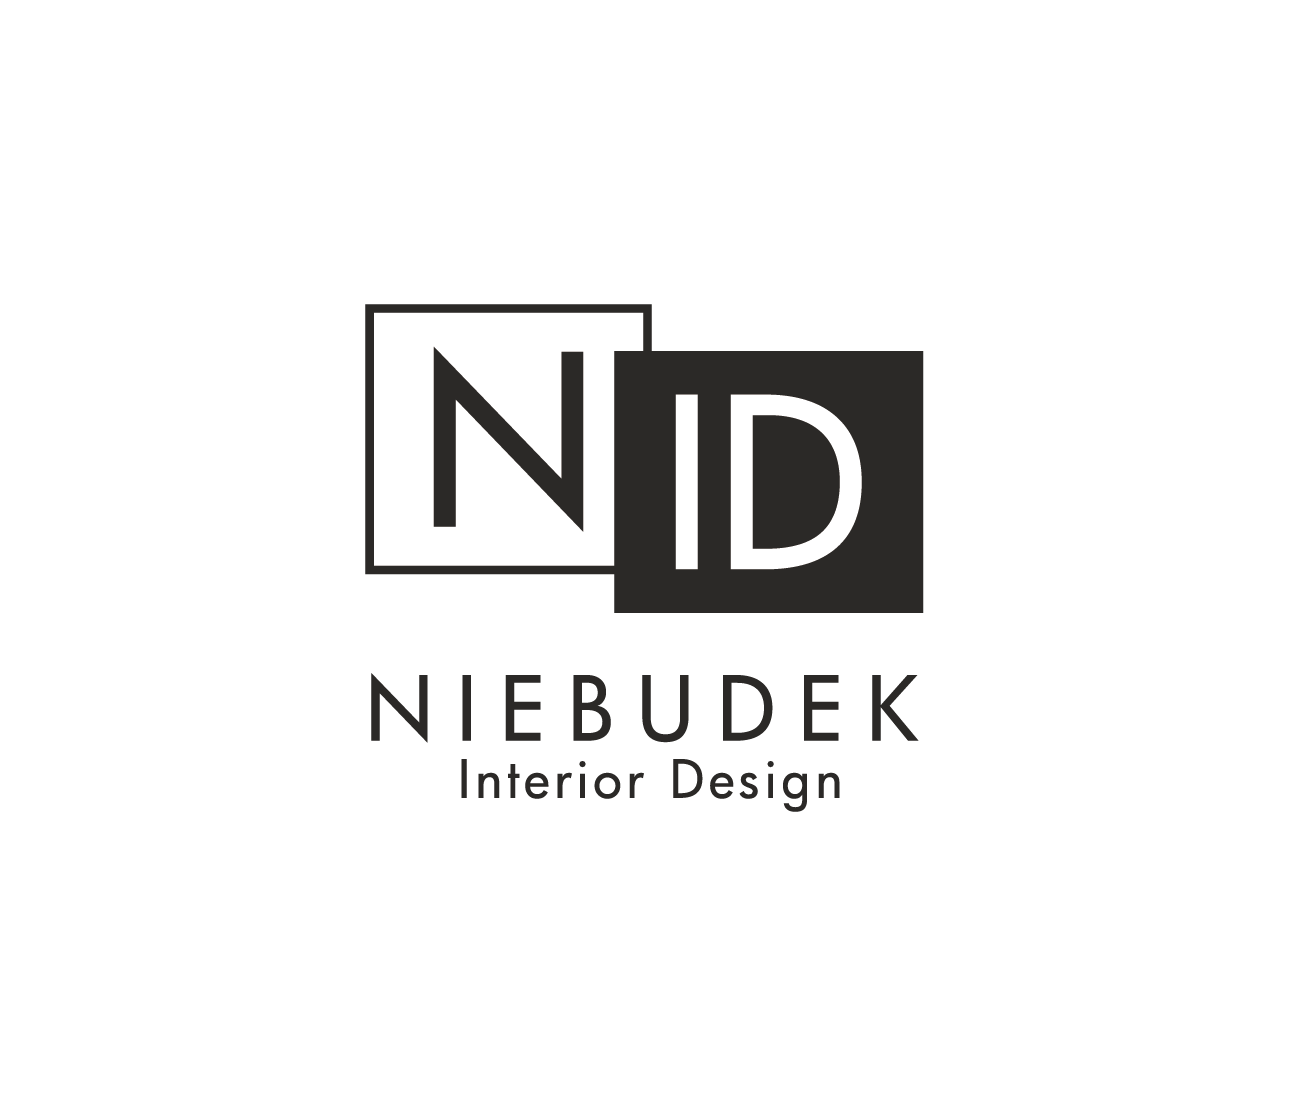 Niebudek Interior Design